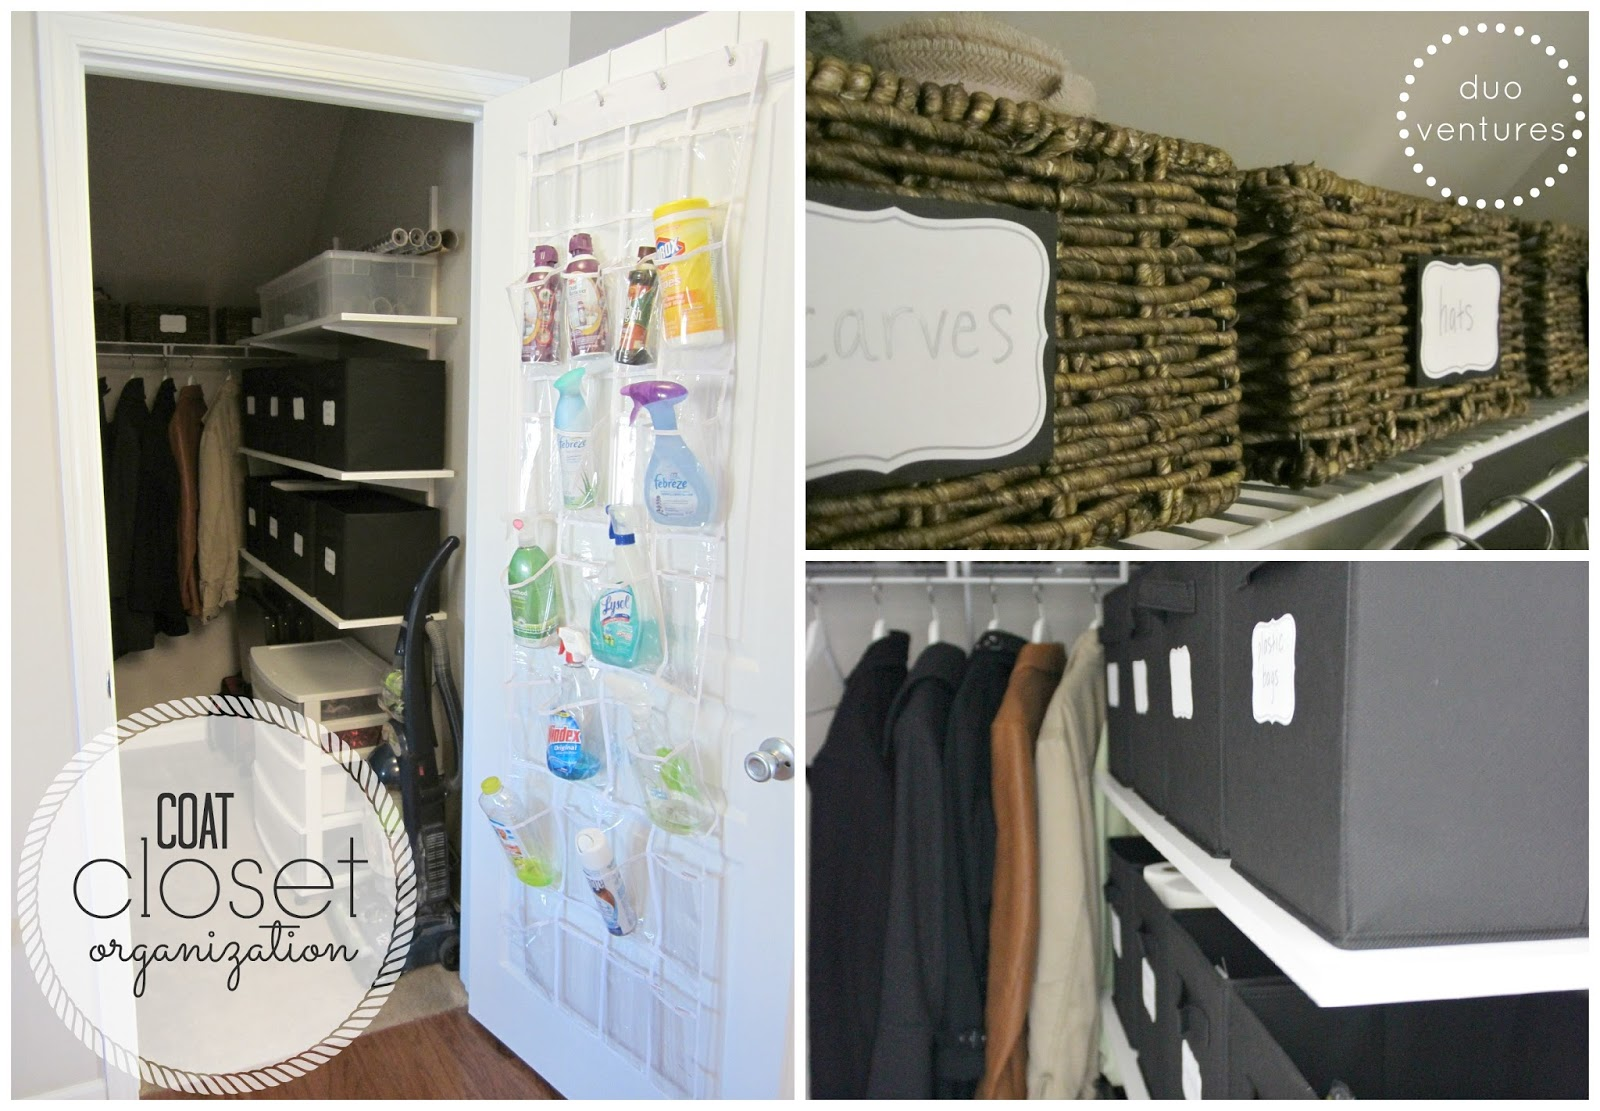 Organizing: The Coat Closet